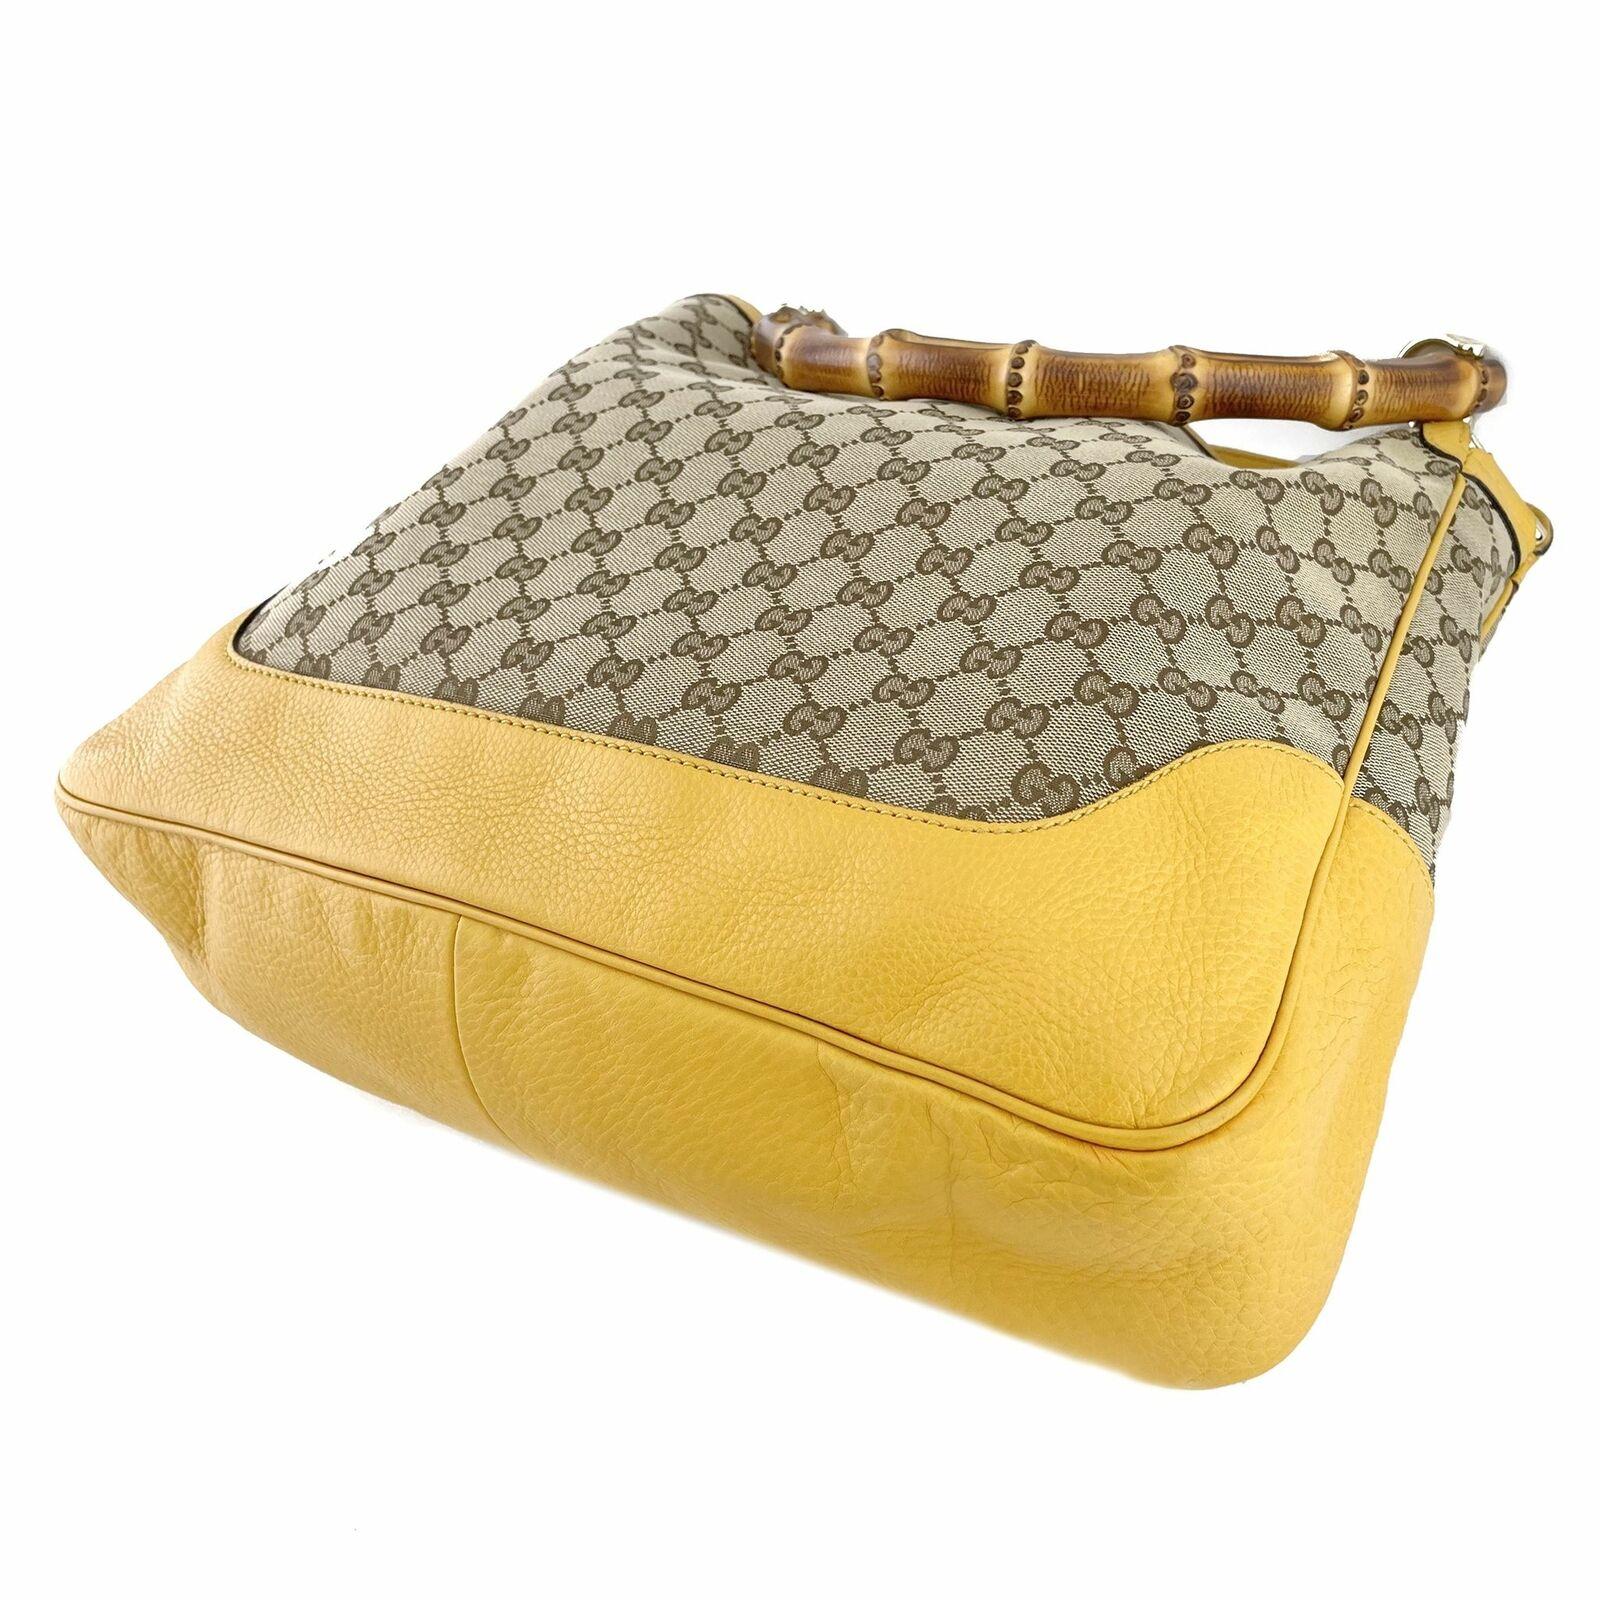 Gucci GG Canvas Diana Bamboo Shoulder Bag - Beige… - image 8